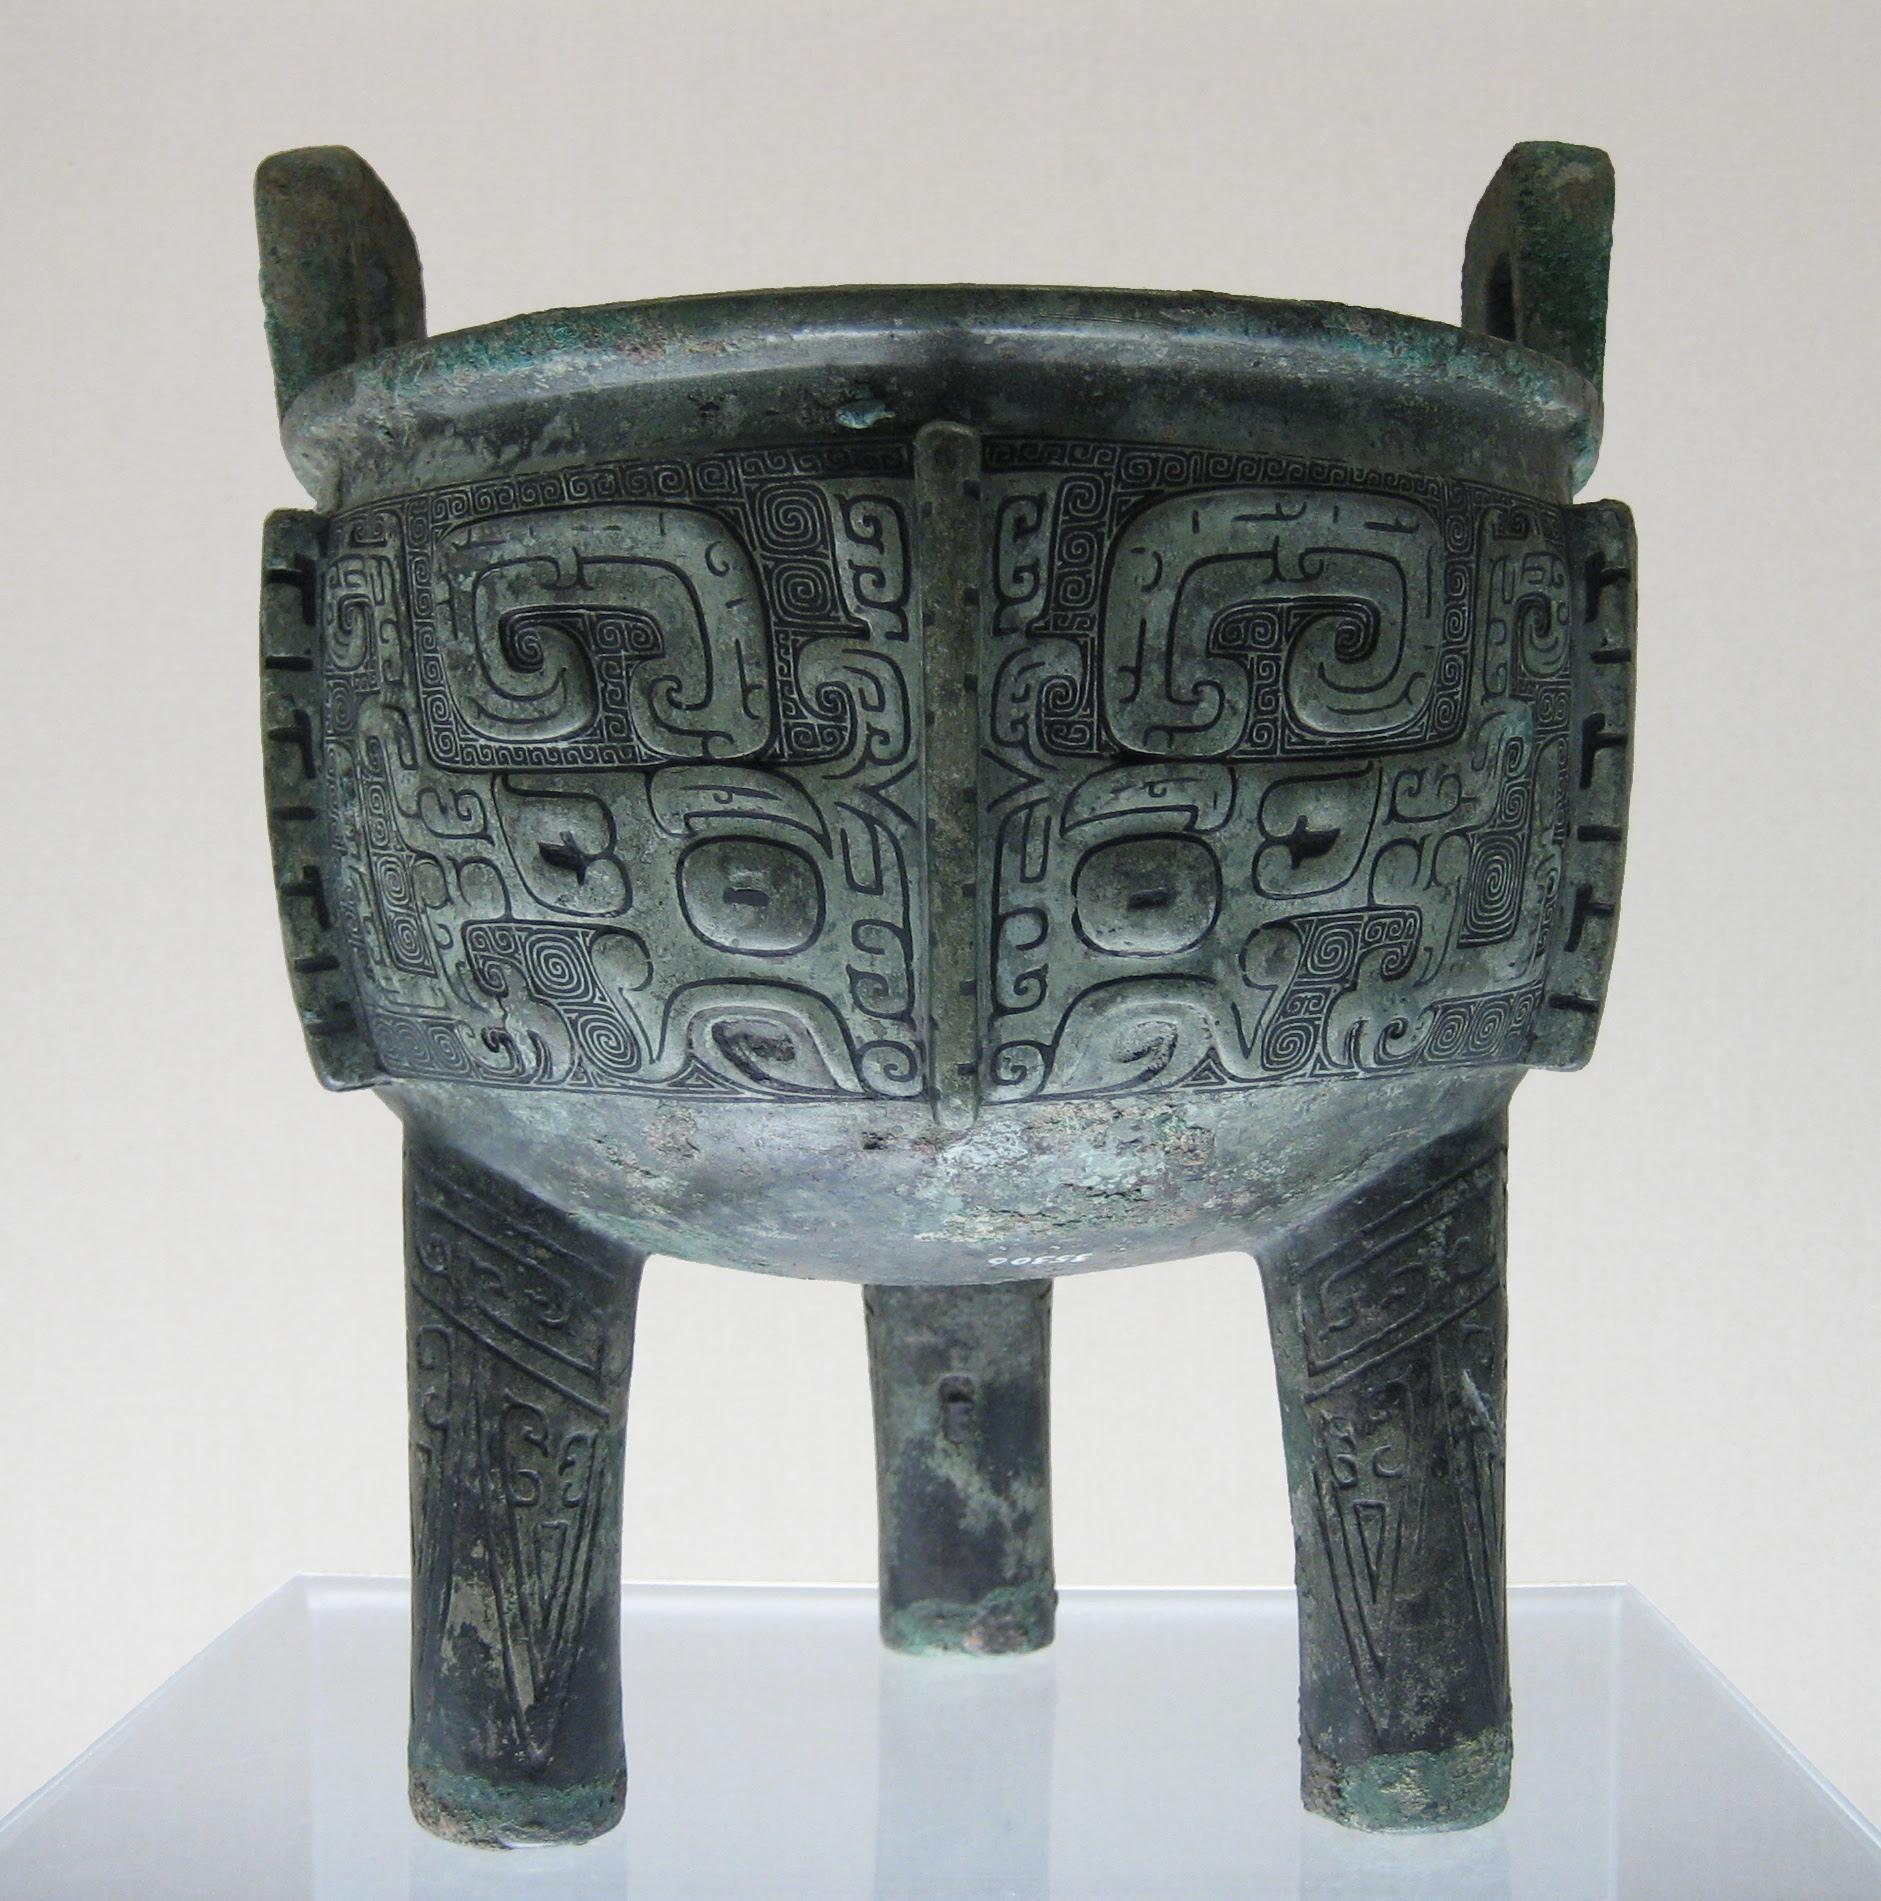 http://upload.wikimedia.org/wikipedia/commons/5/50/Liu_Ding.jpg